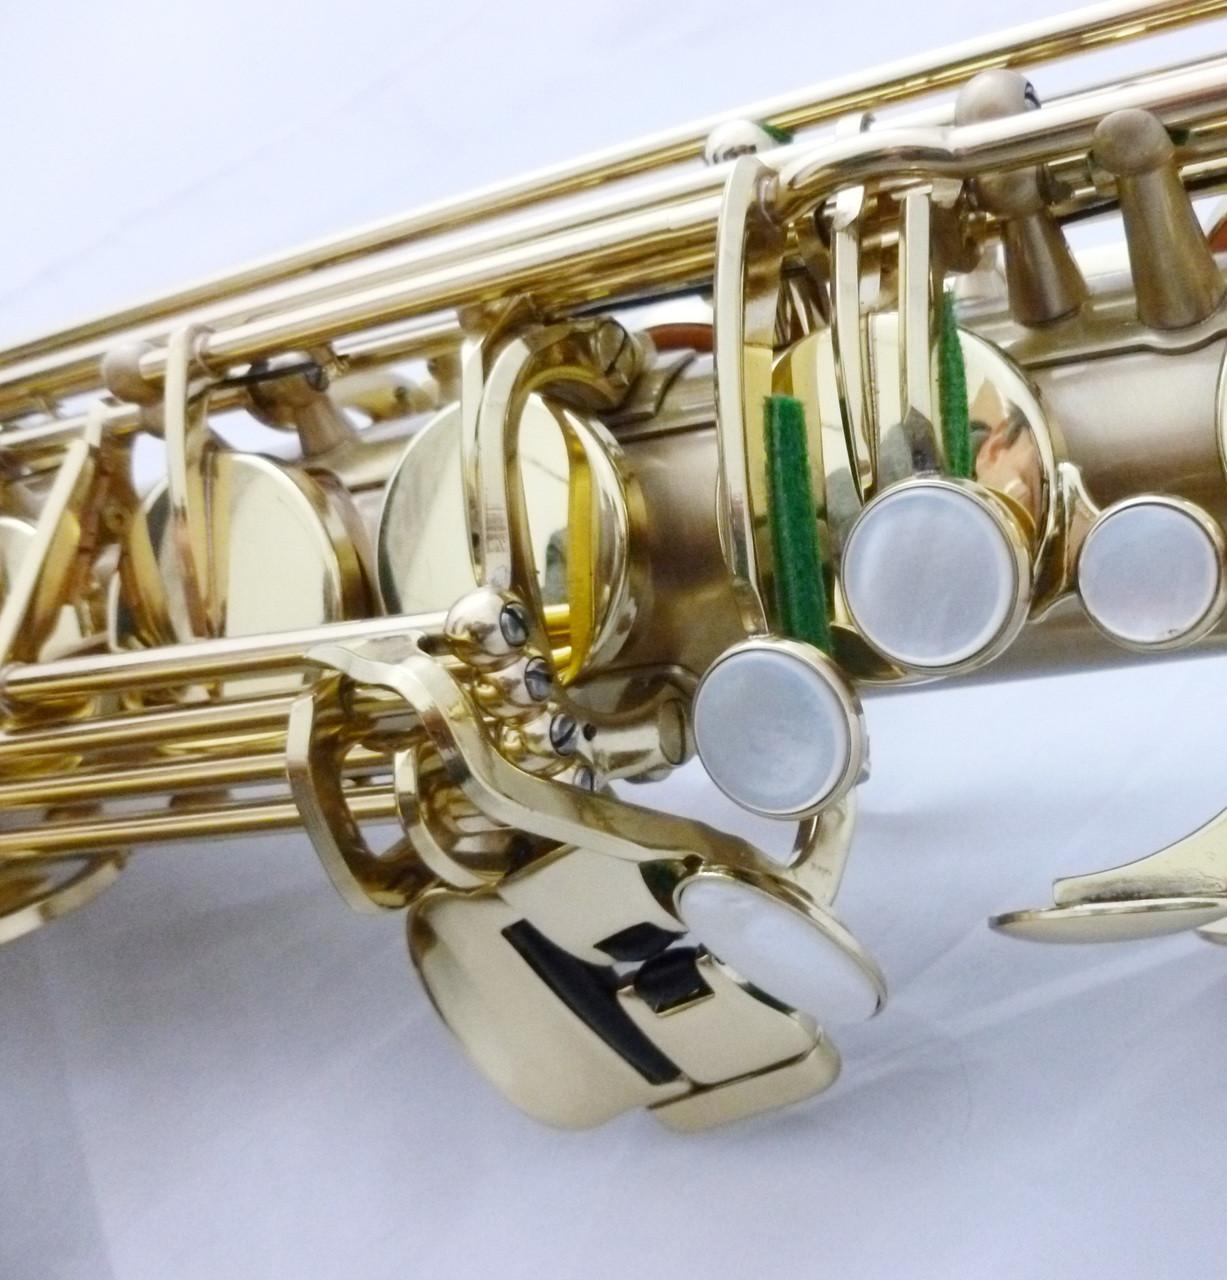 P Mauriat Le Bravo 200 Tenor Saxophone 1